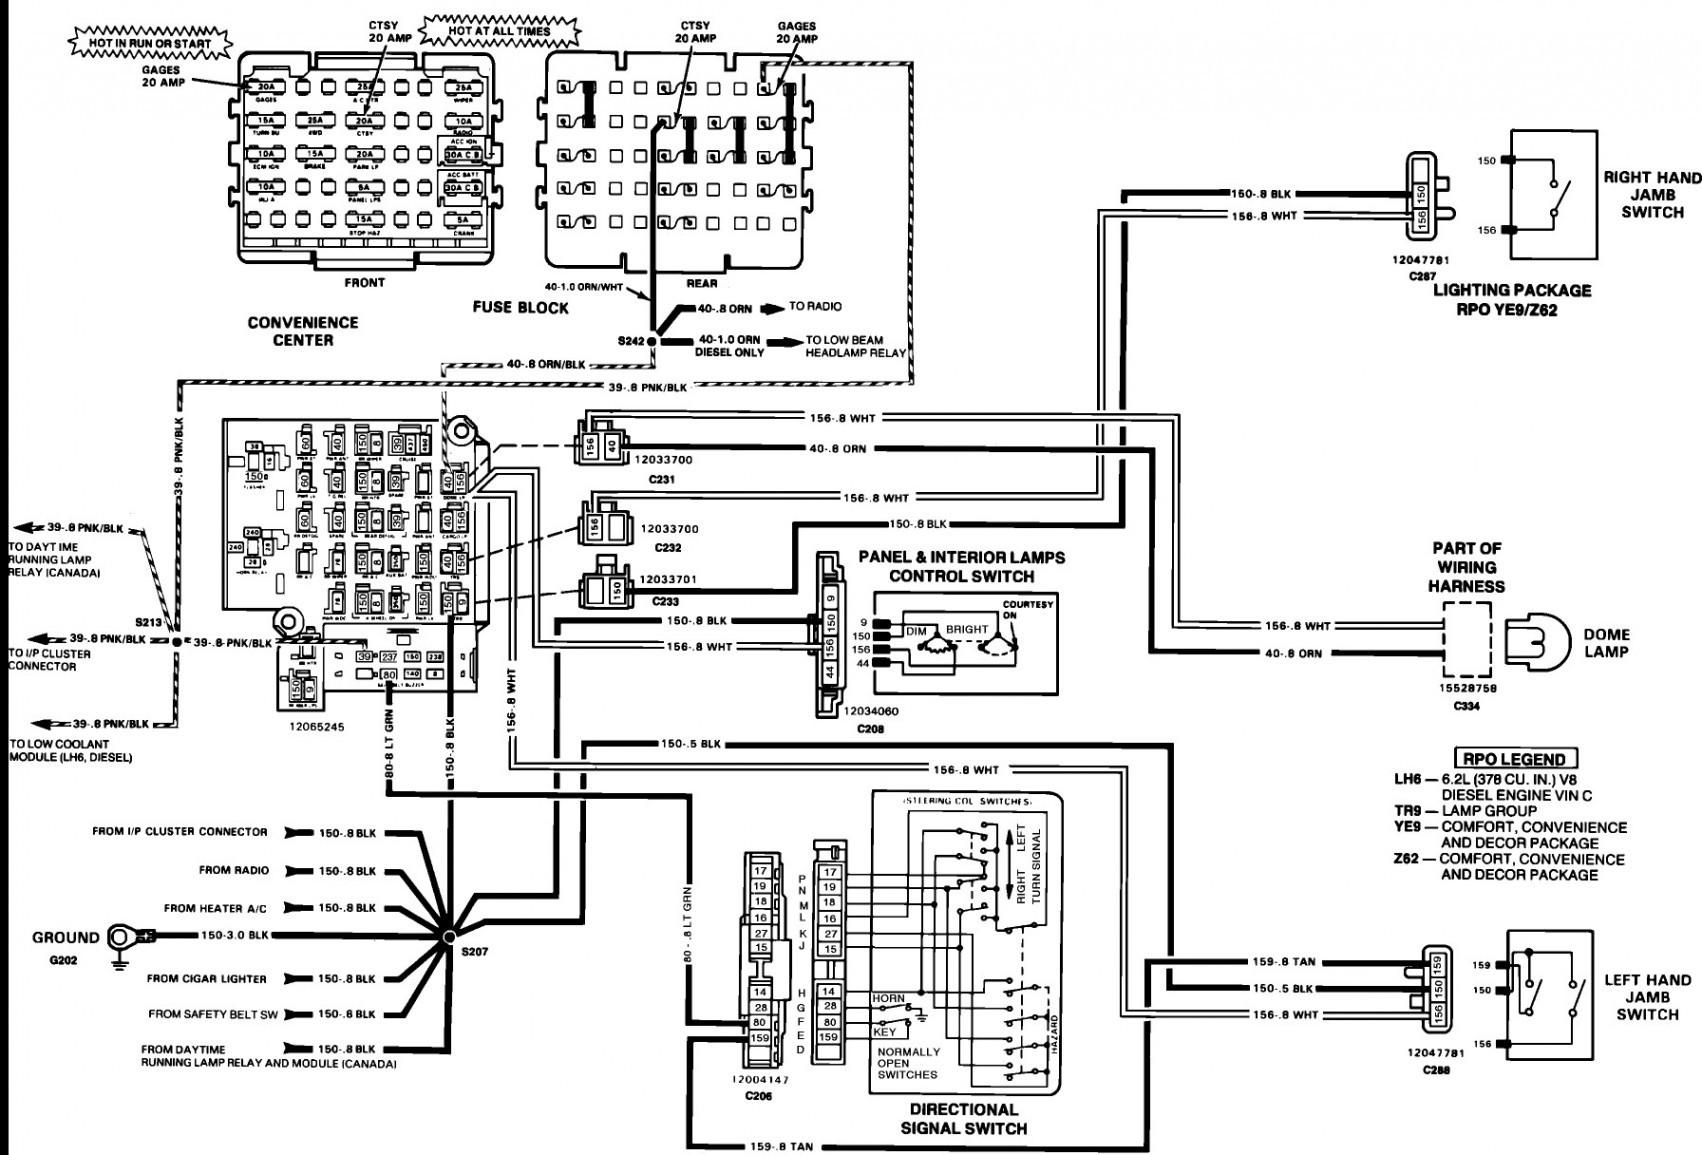 1984 Chevy Truck Fuse Box Diagram 1989 toyota Van Fuse Box Wiring Diagram • Of 1984 Chevy Truck Fuse Box Diagram